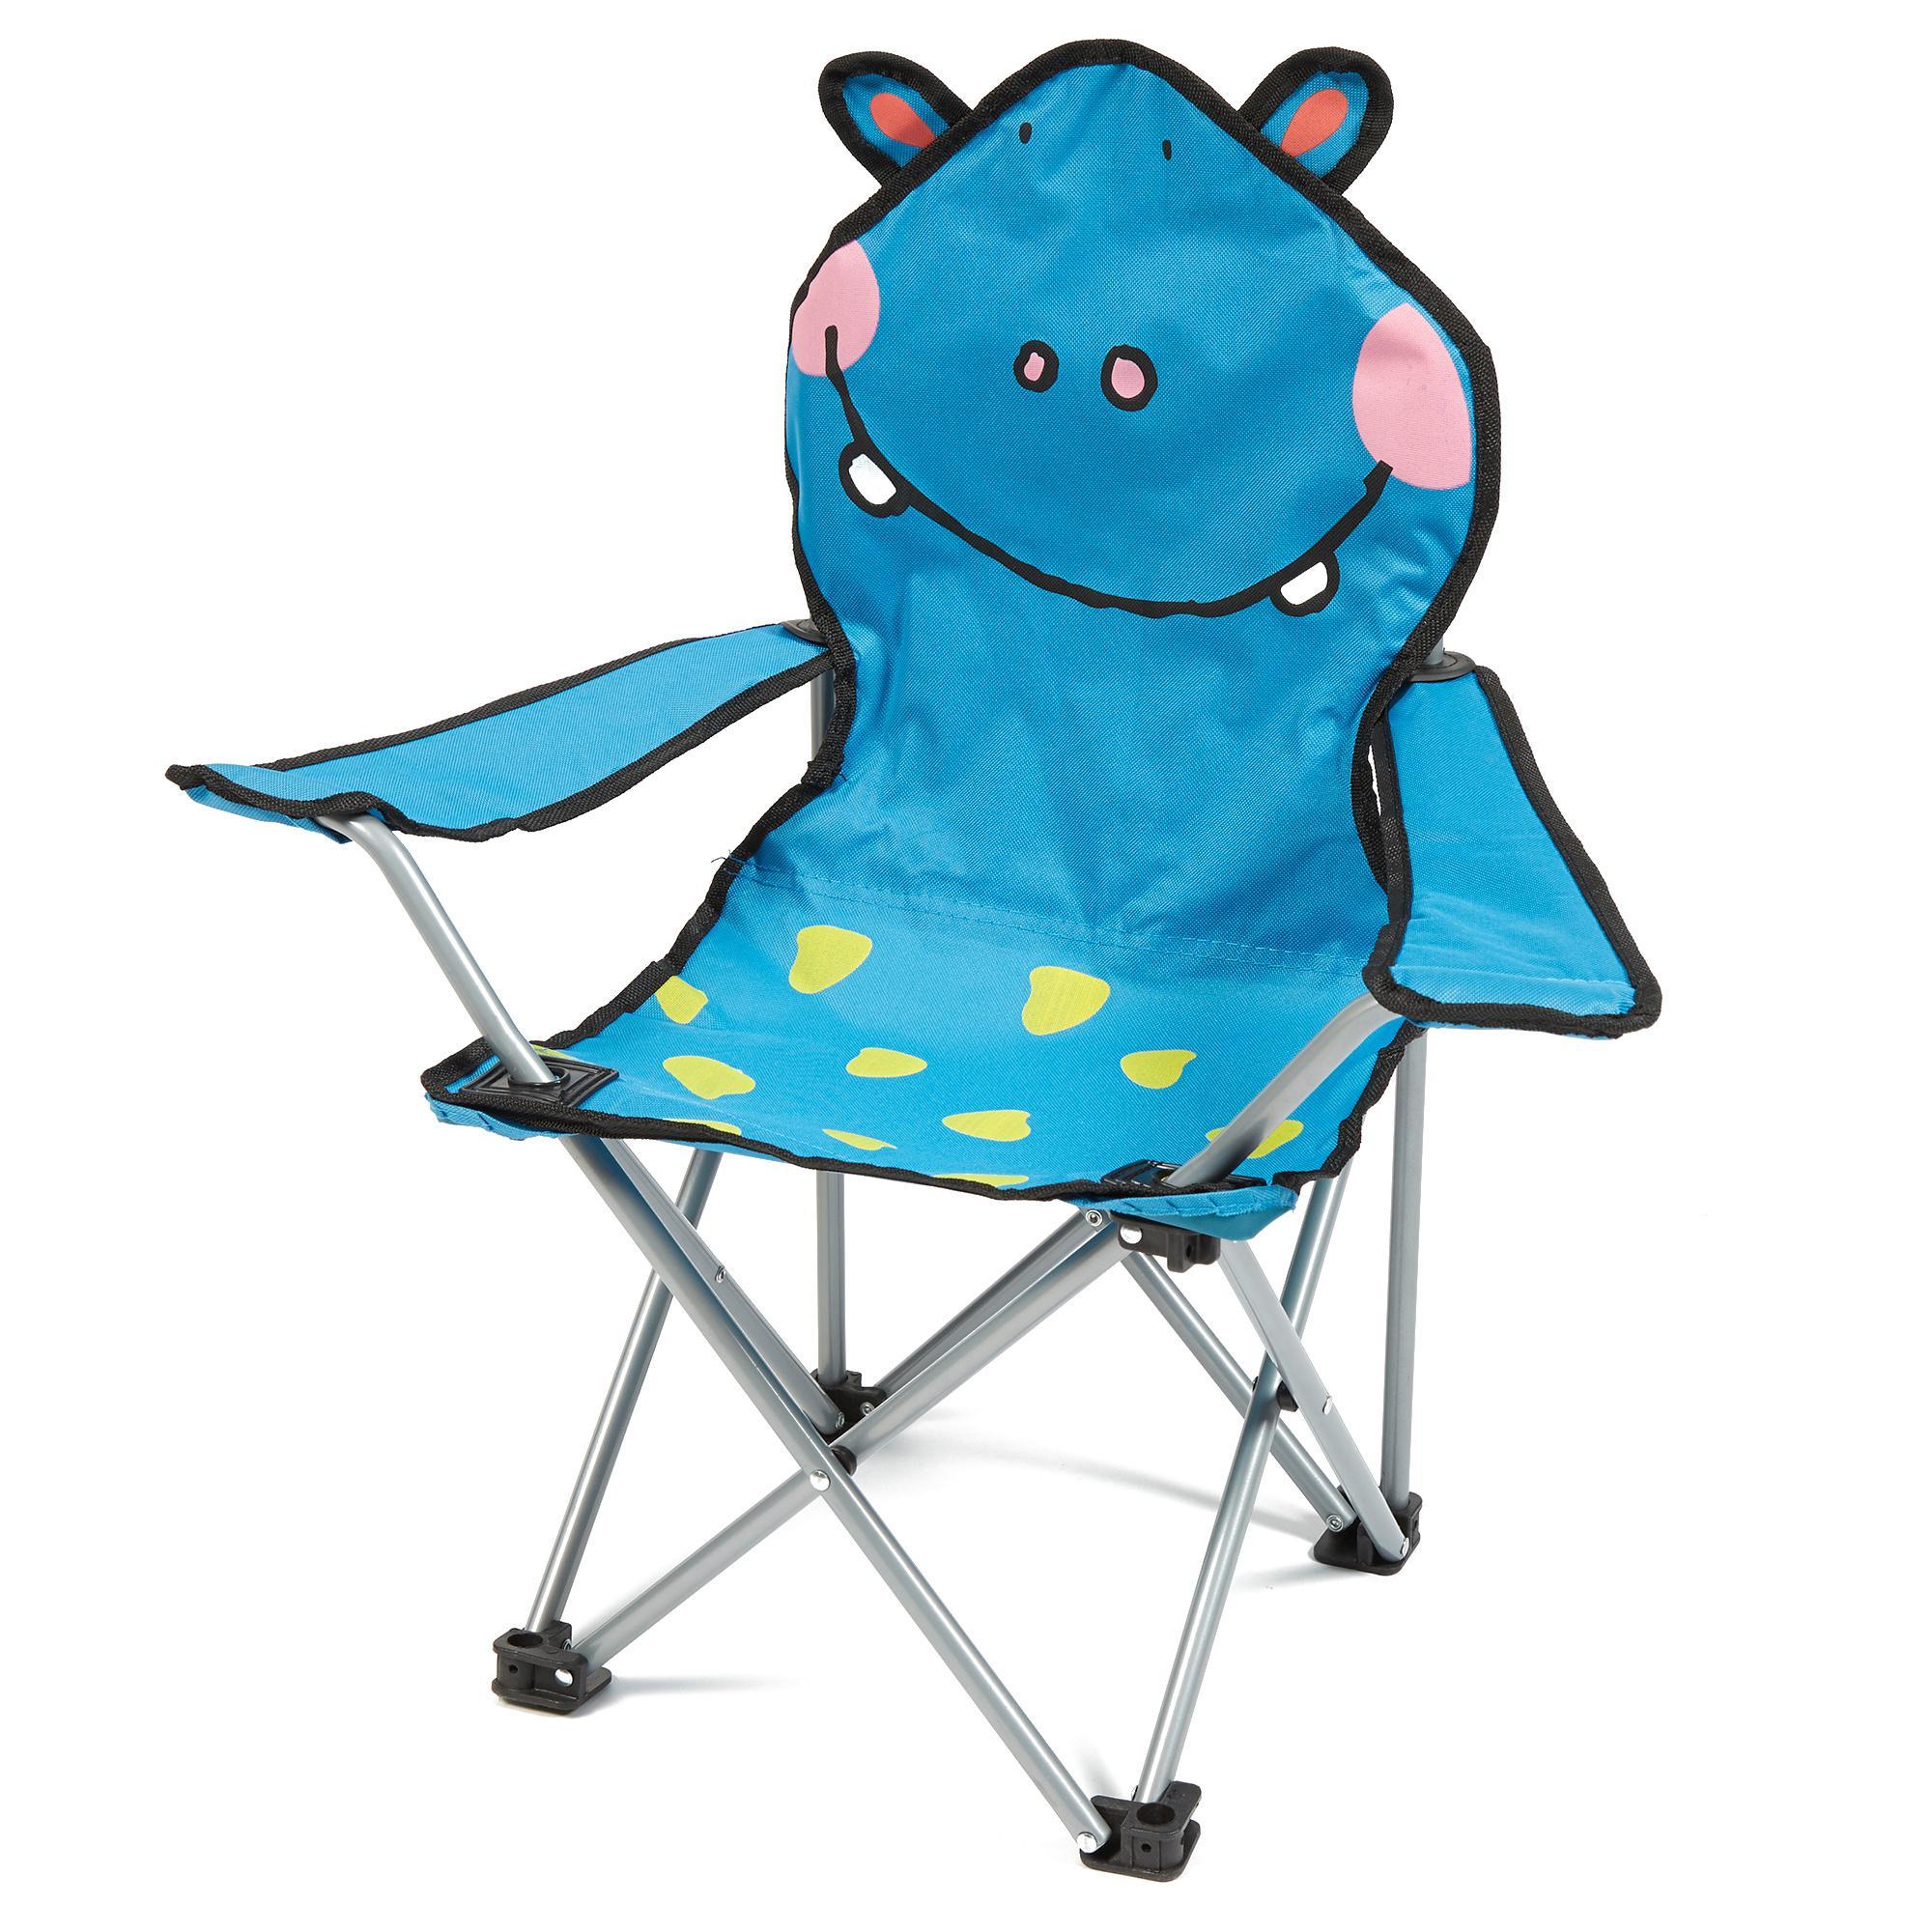 Charming Kidsu0027 Hippo Chair